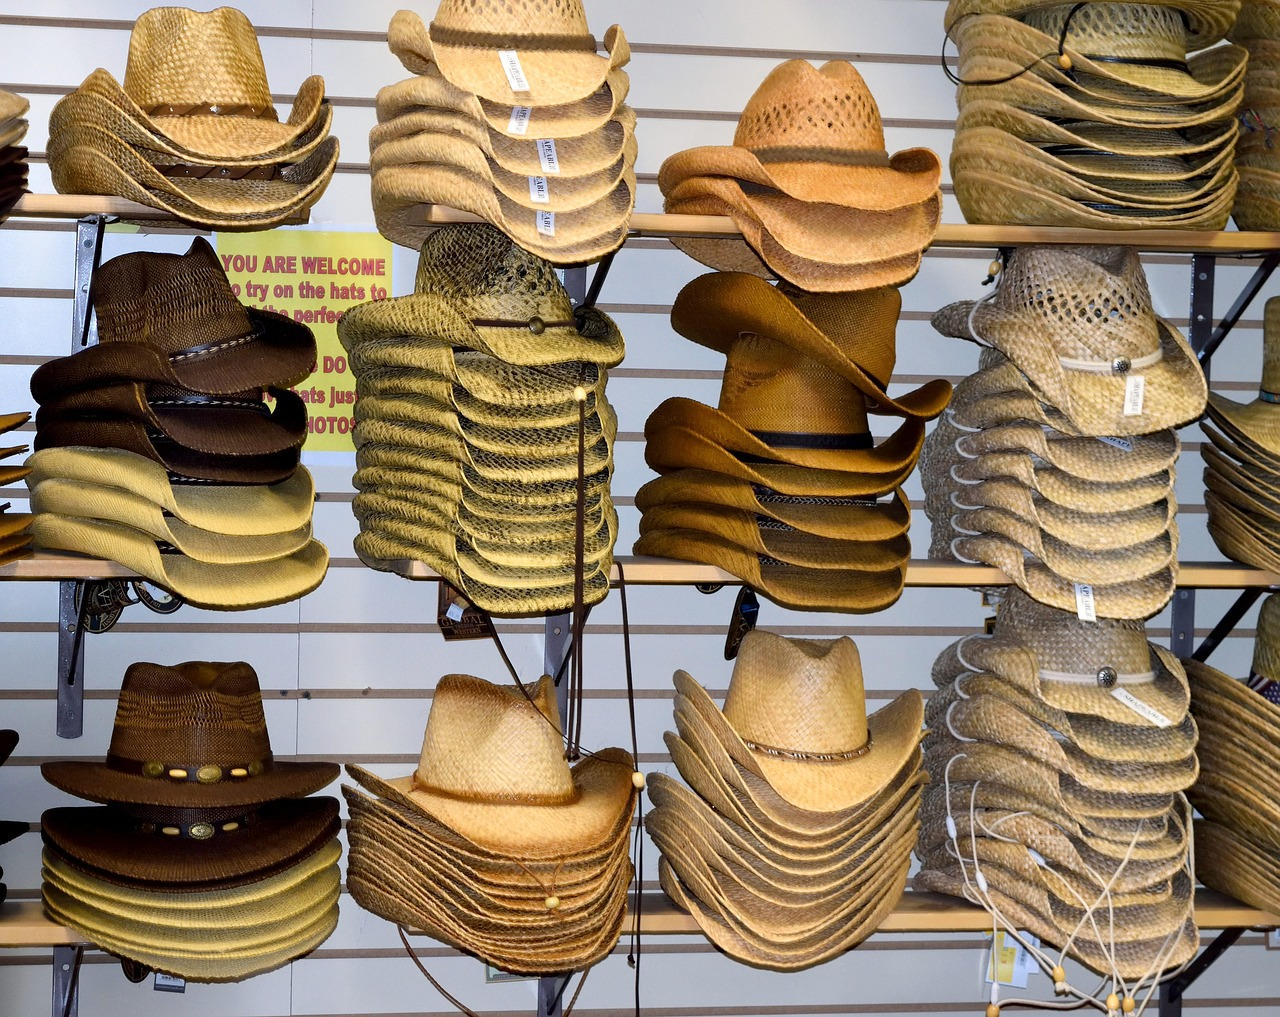 c3637af65f3 Cowboy hats